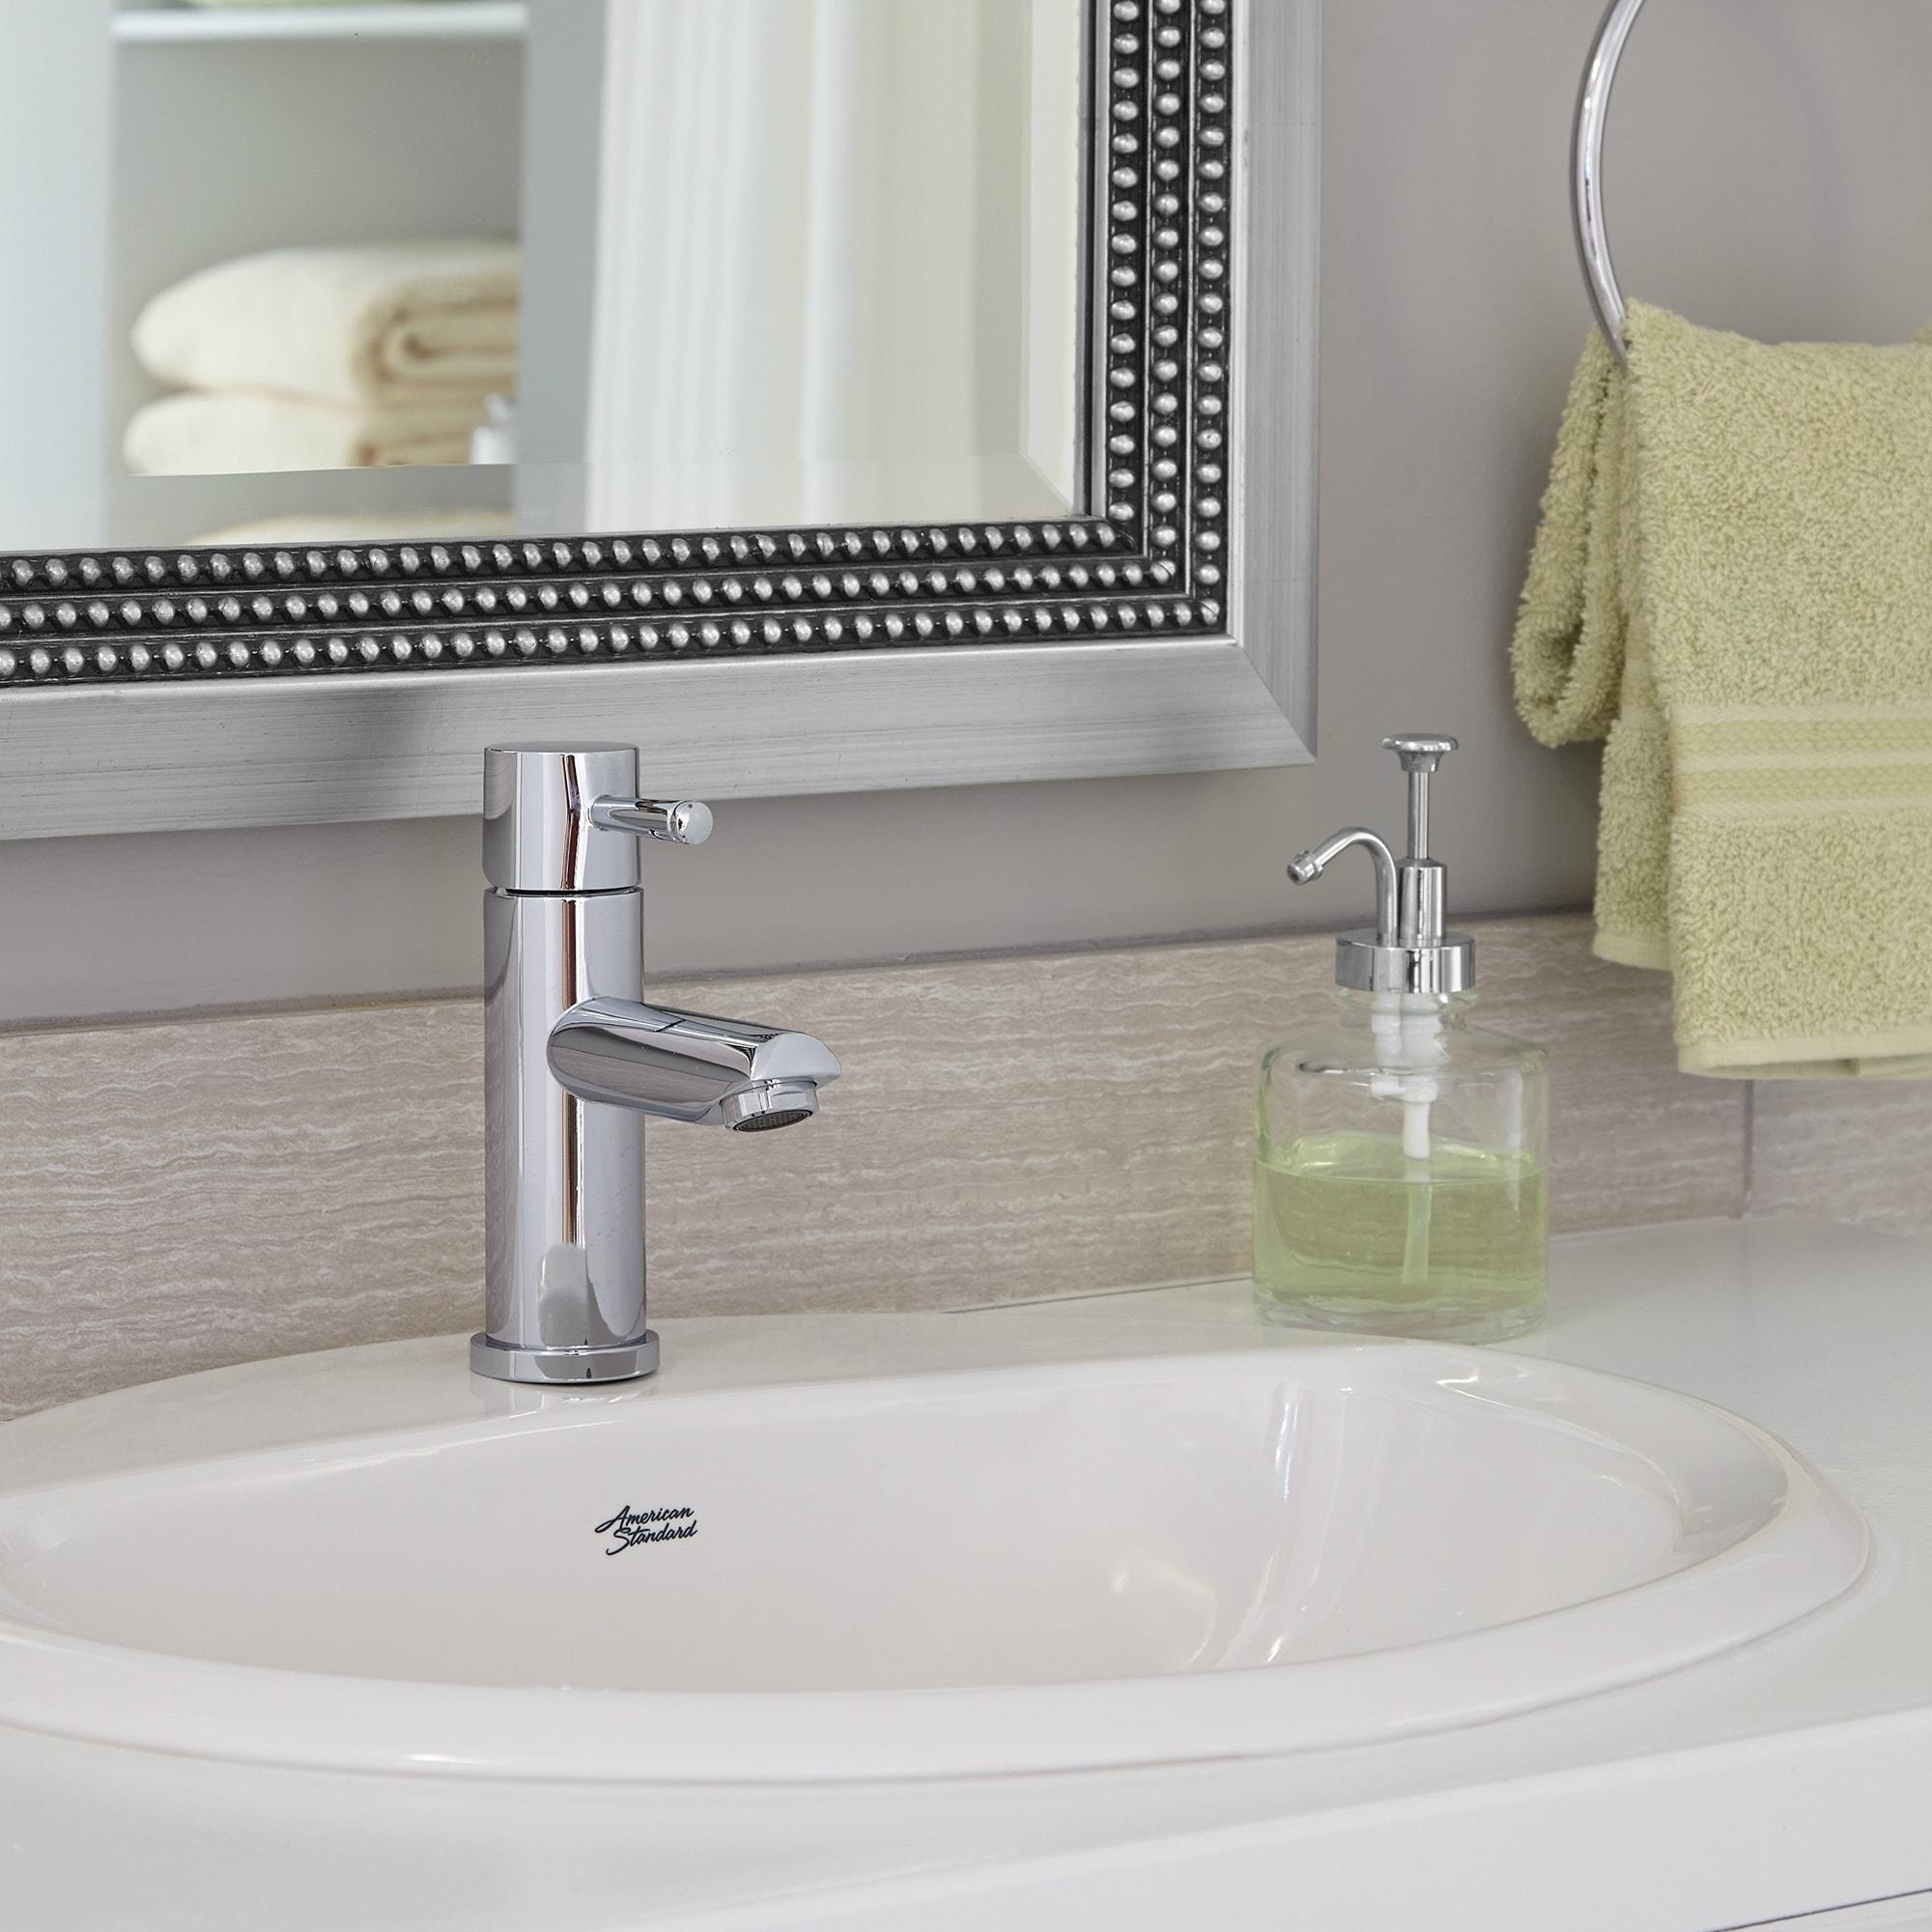 Shop American Standard Aqualyn Drop In Porcelain Bathroom Sink ...